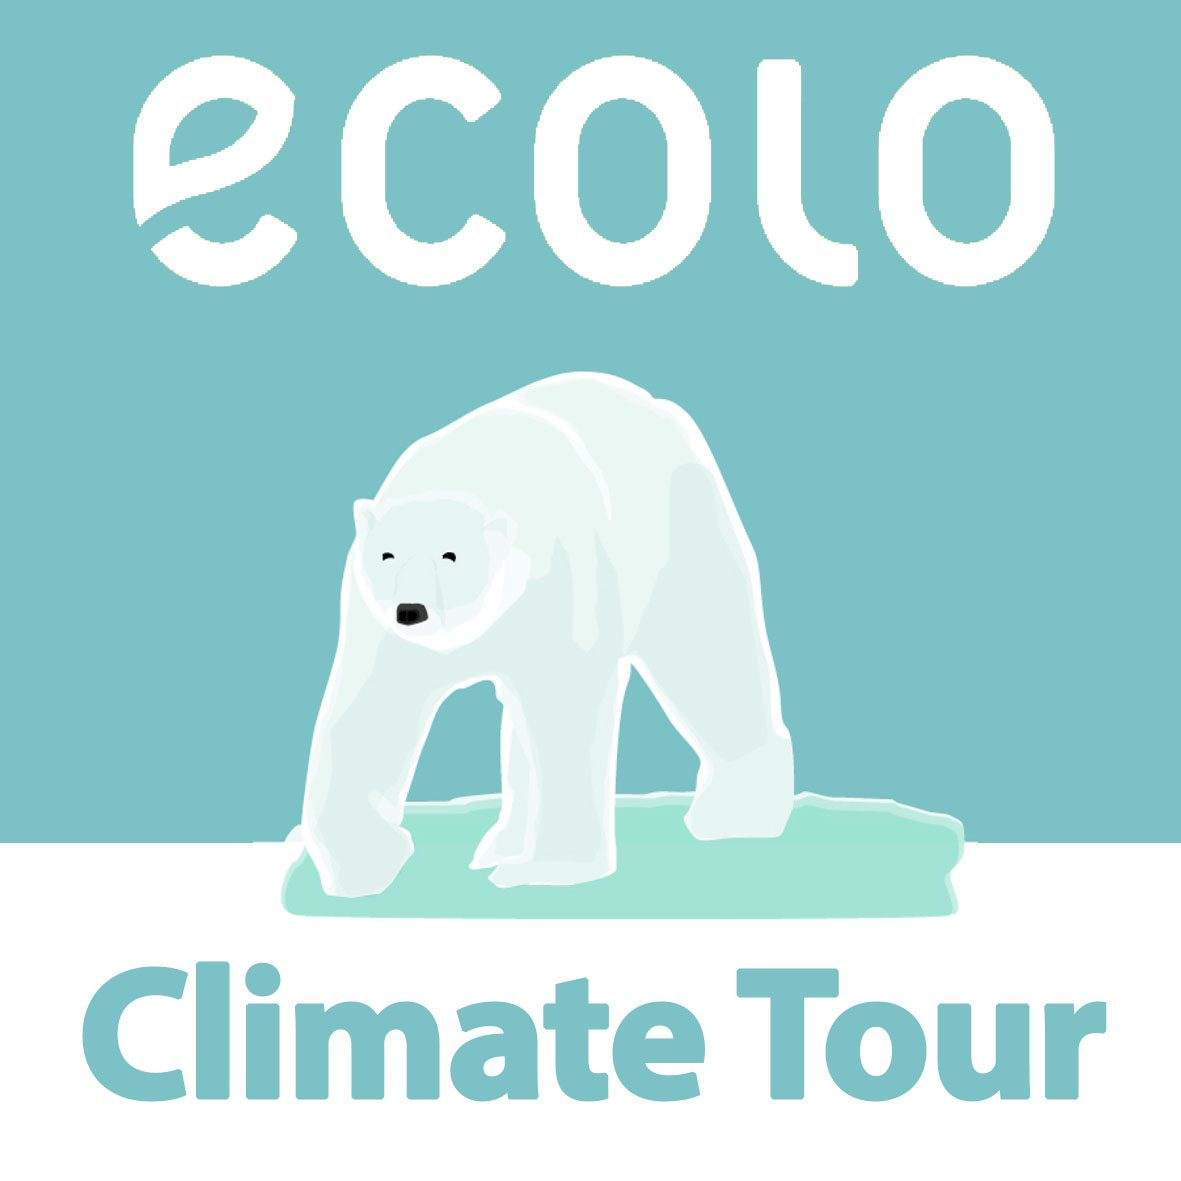 #EcoloClimateTour